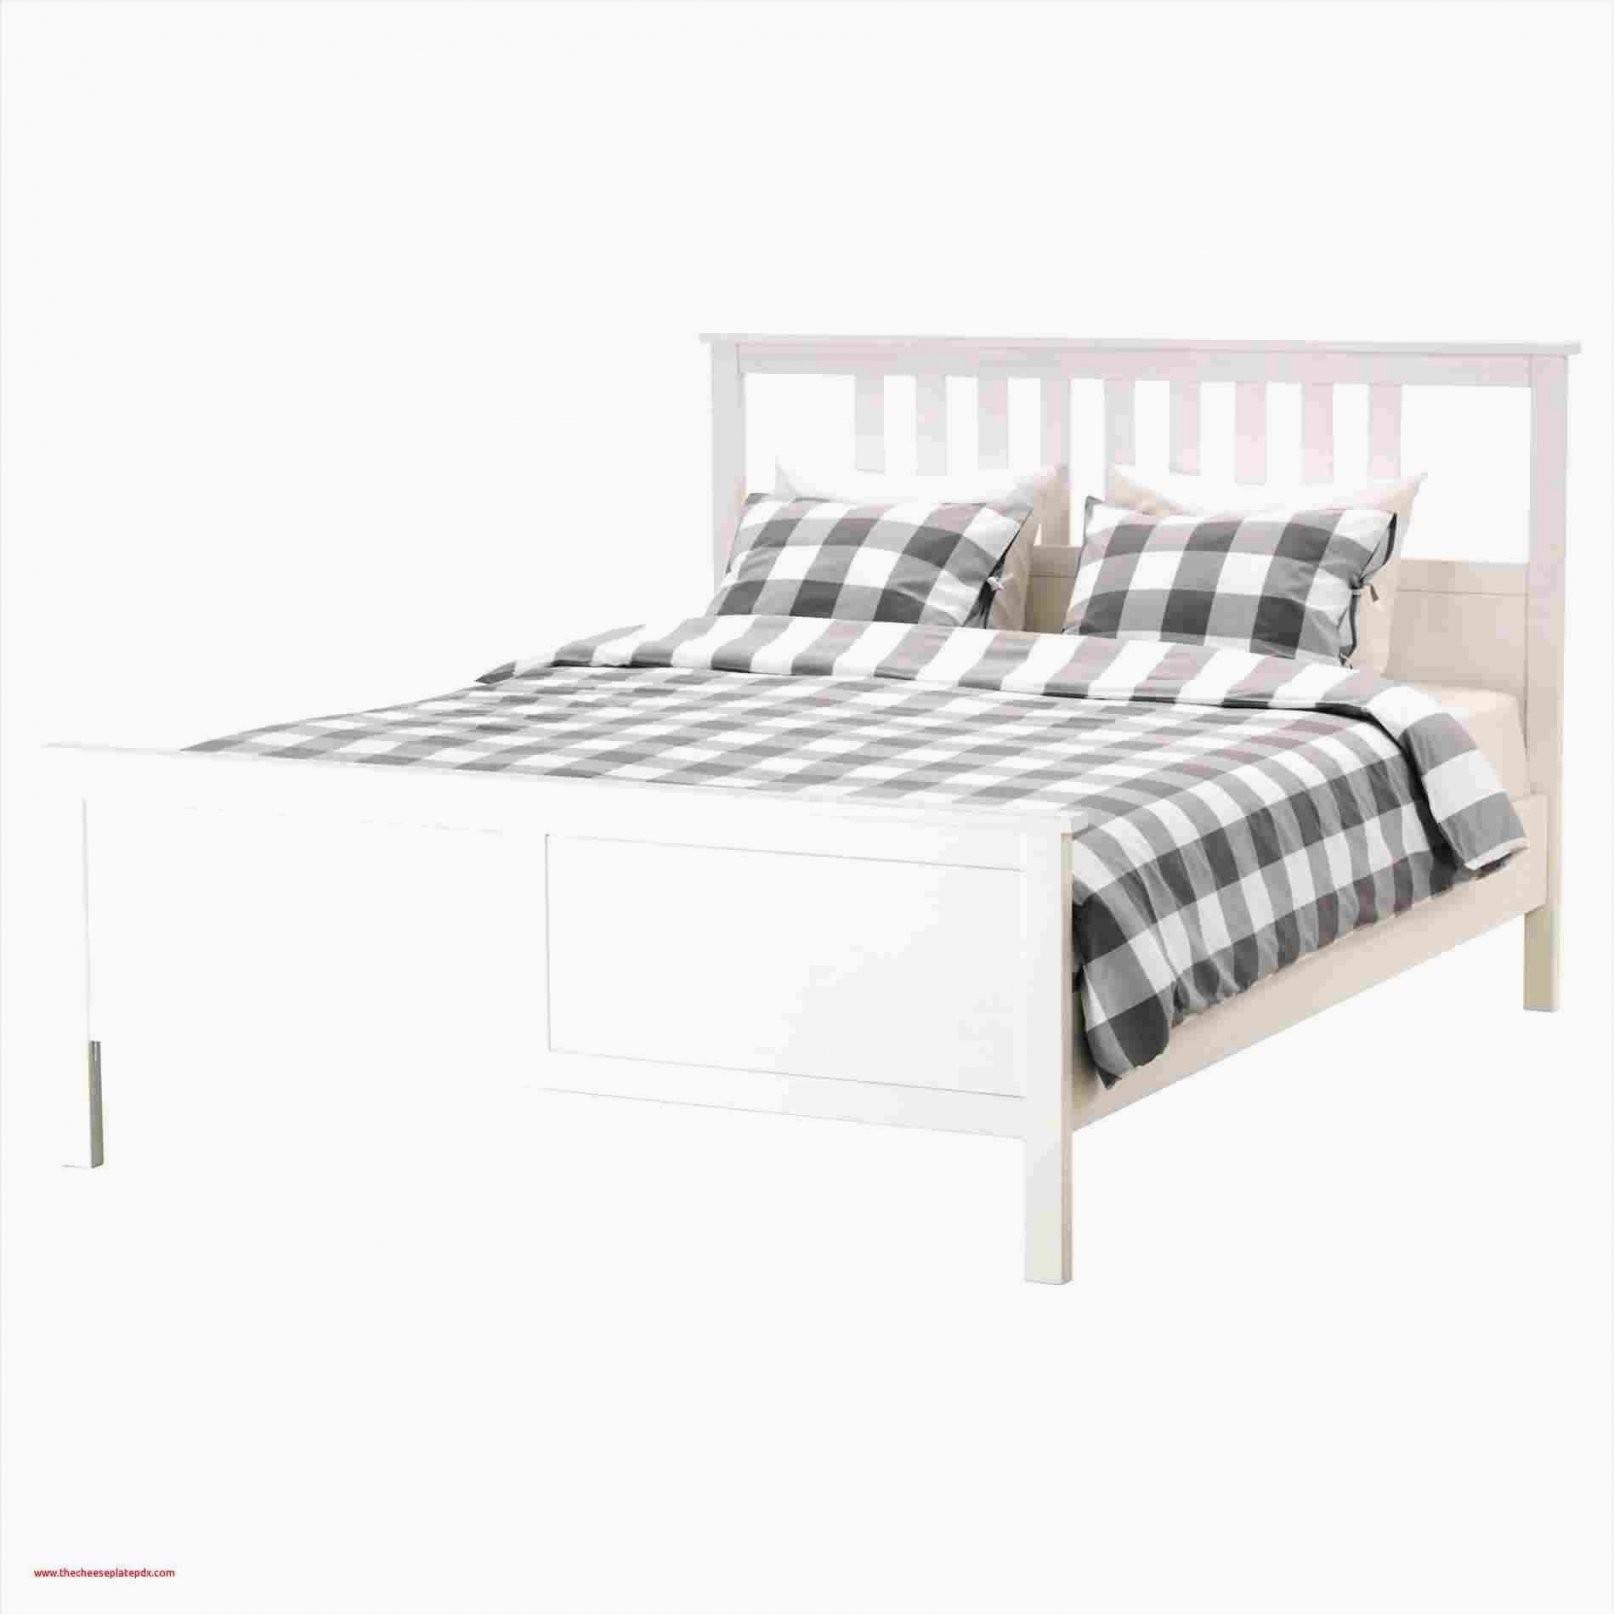 Ikea Bedden 160 X 200 Opmerkelijke Ikea Betten 160—200 Weiss von Ikea Betten 160X200 Weiss Bild